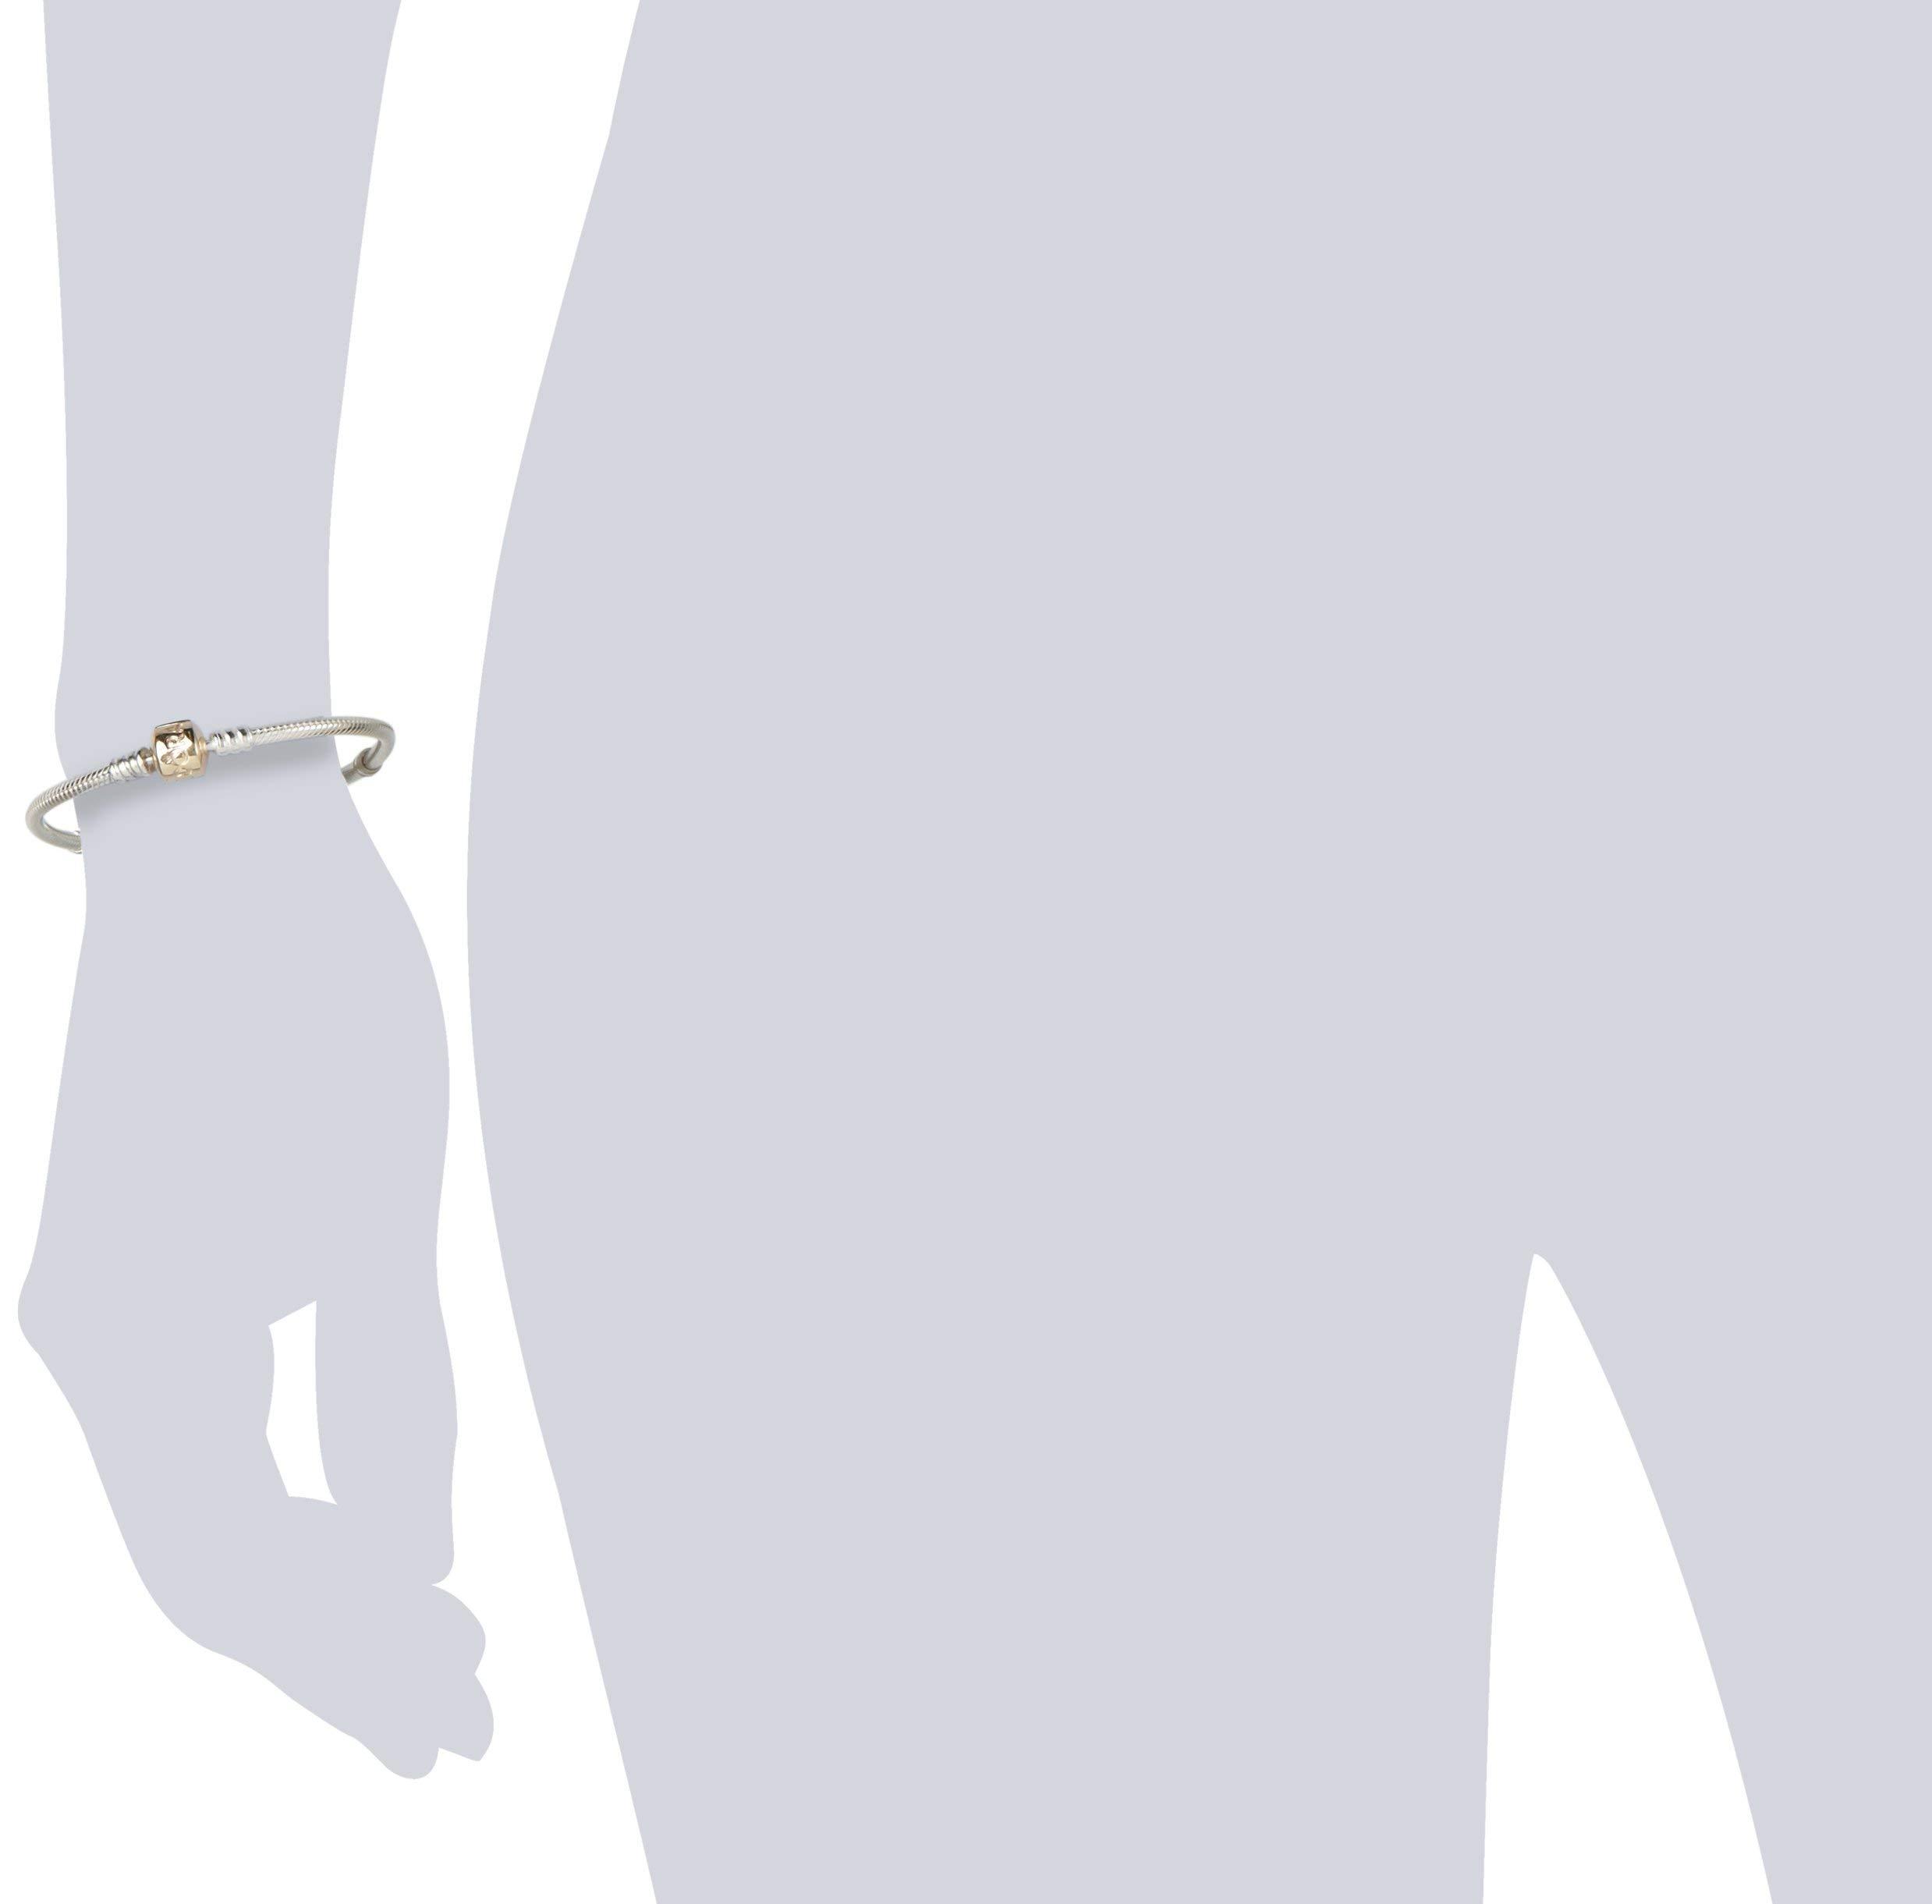 PANDORA-Womens-Iconic-Standard-925-Sterling-Silver-Charm-Bracelet-590702HV